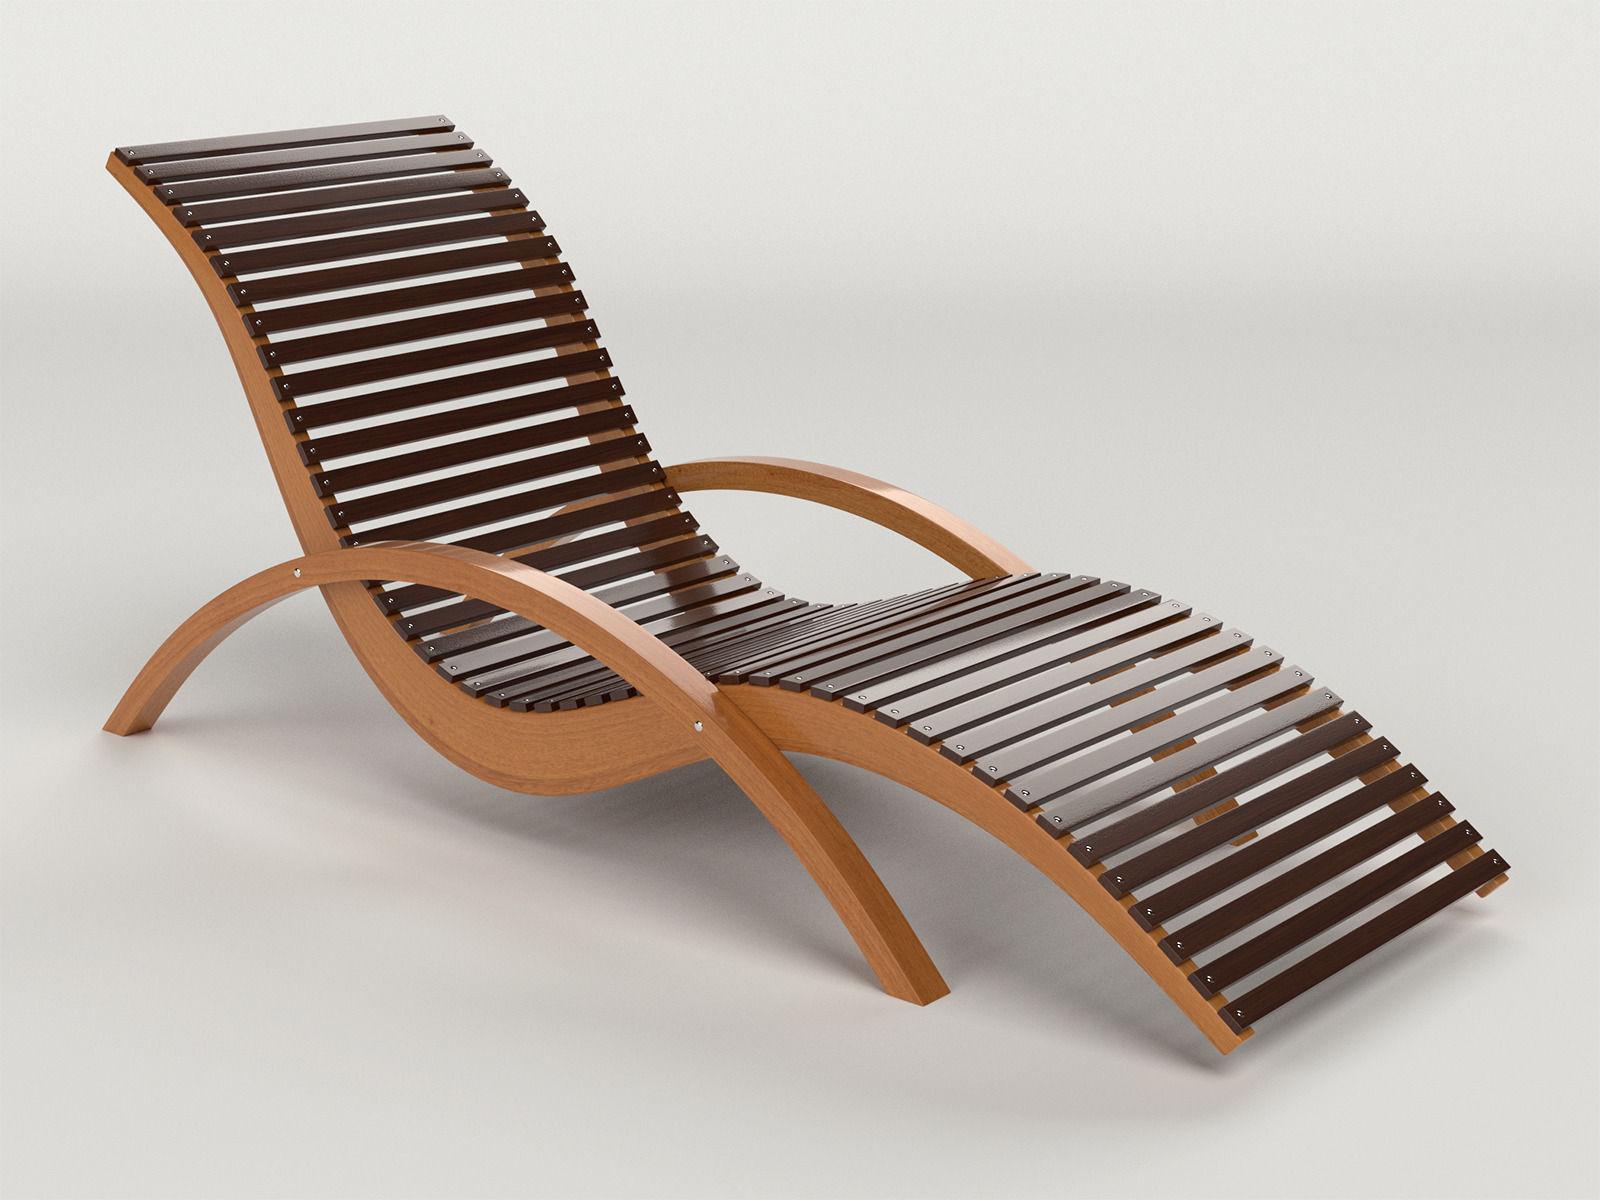 Lounge Chair Outdoor Wood Patio Deck 3D Model obj